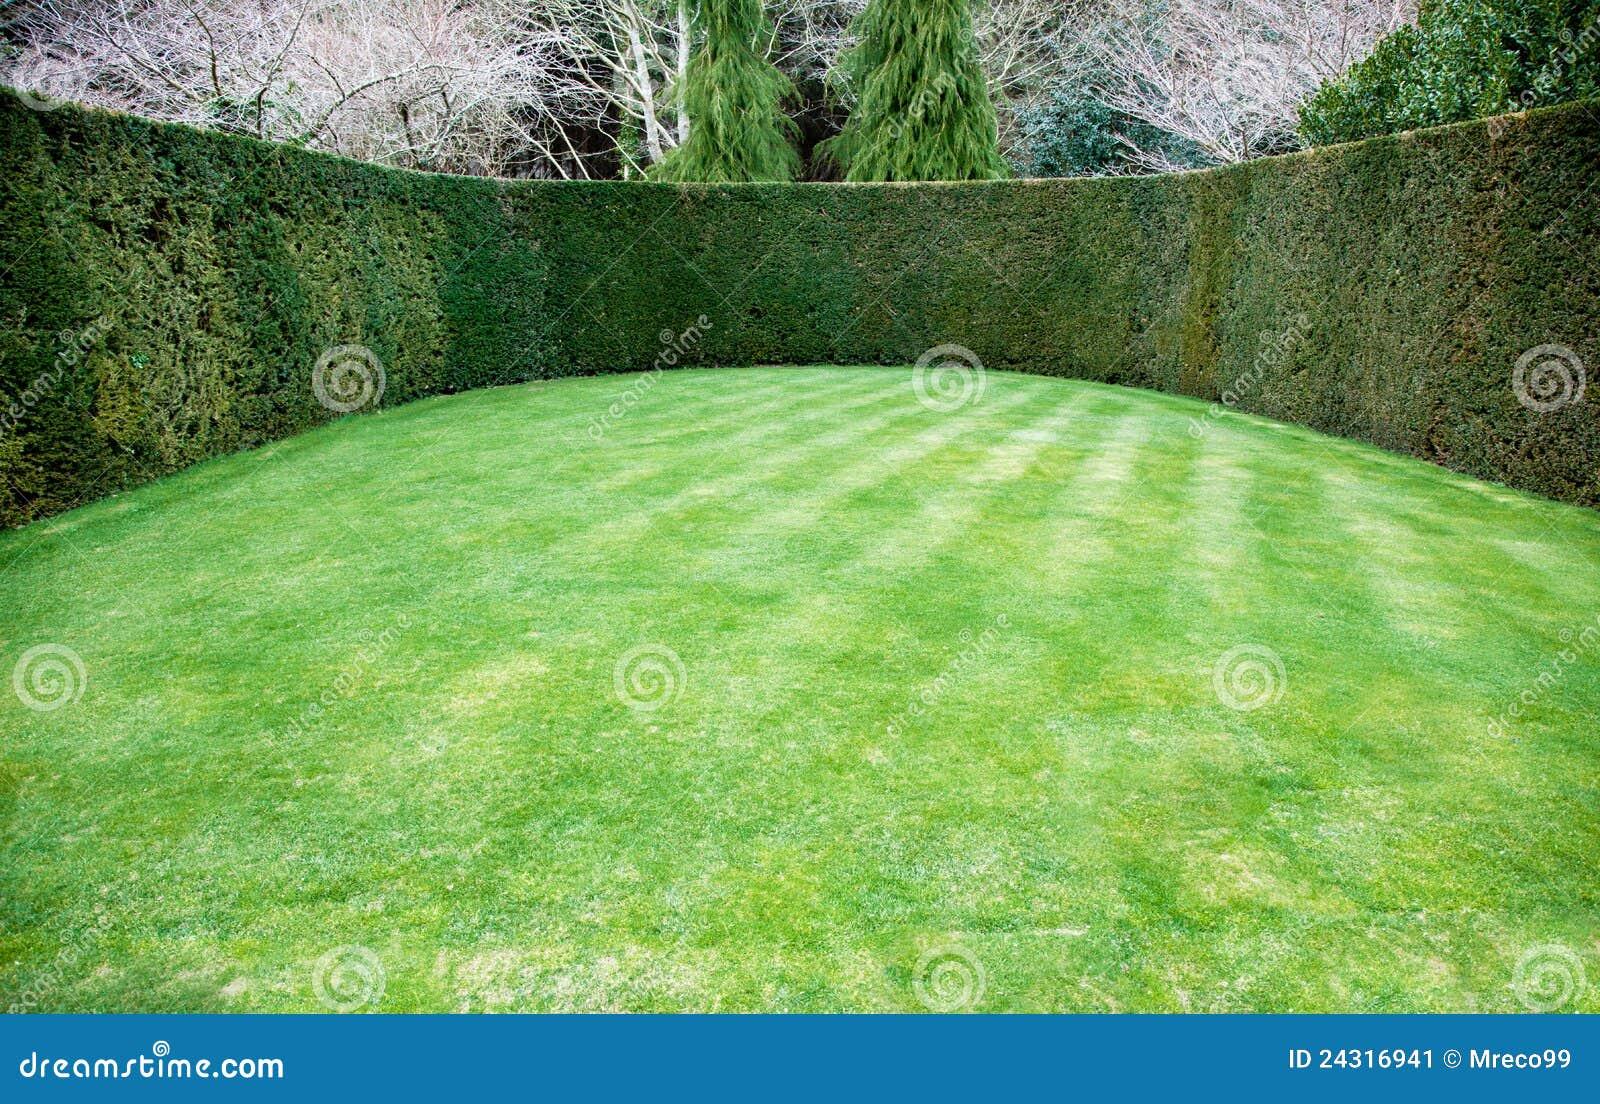 Haie garnie autour de pelouse ovale image stock image for Haie de jardin moderne